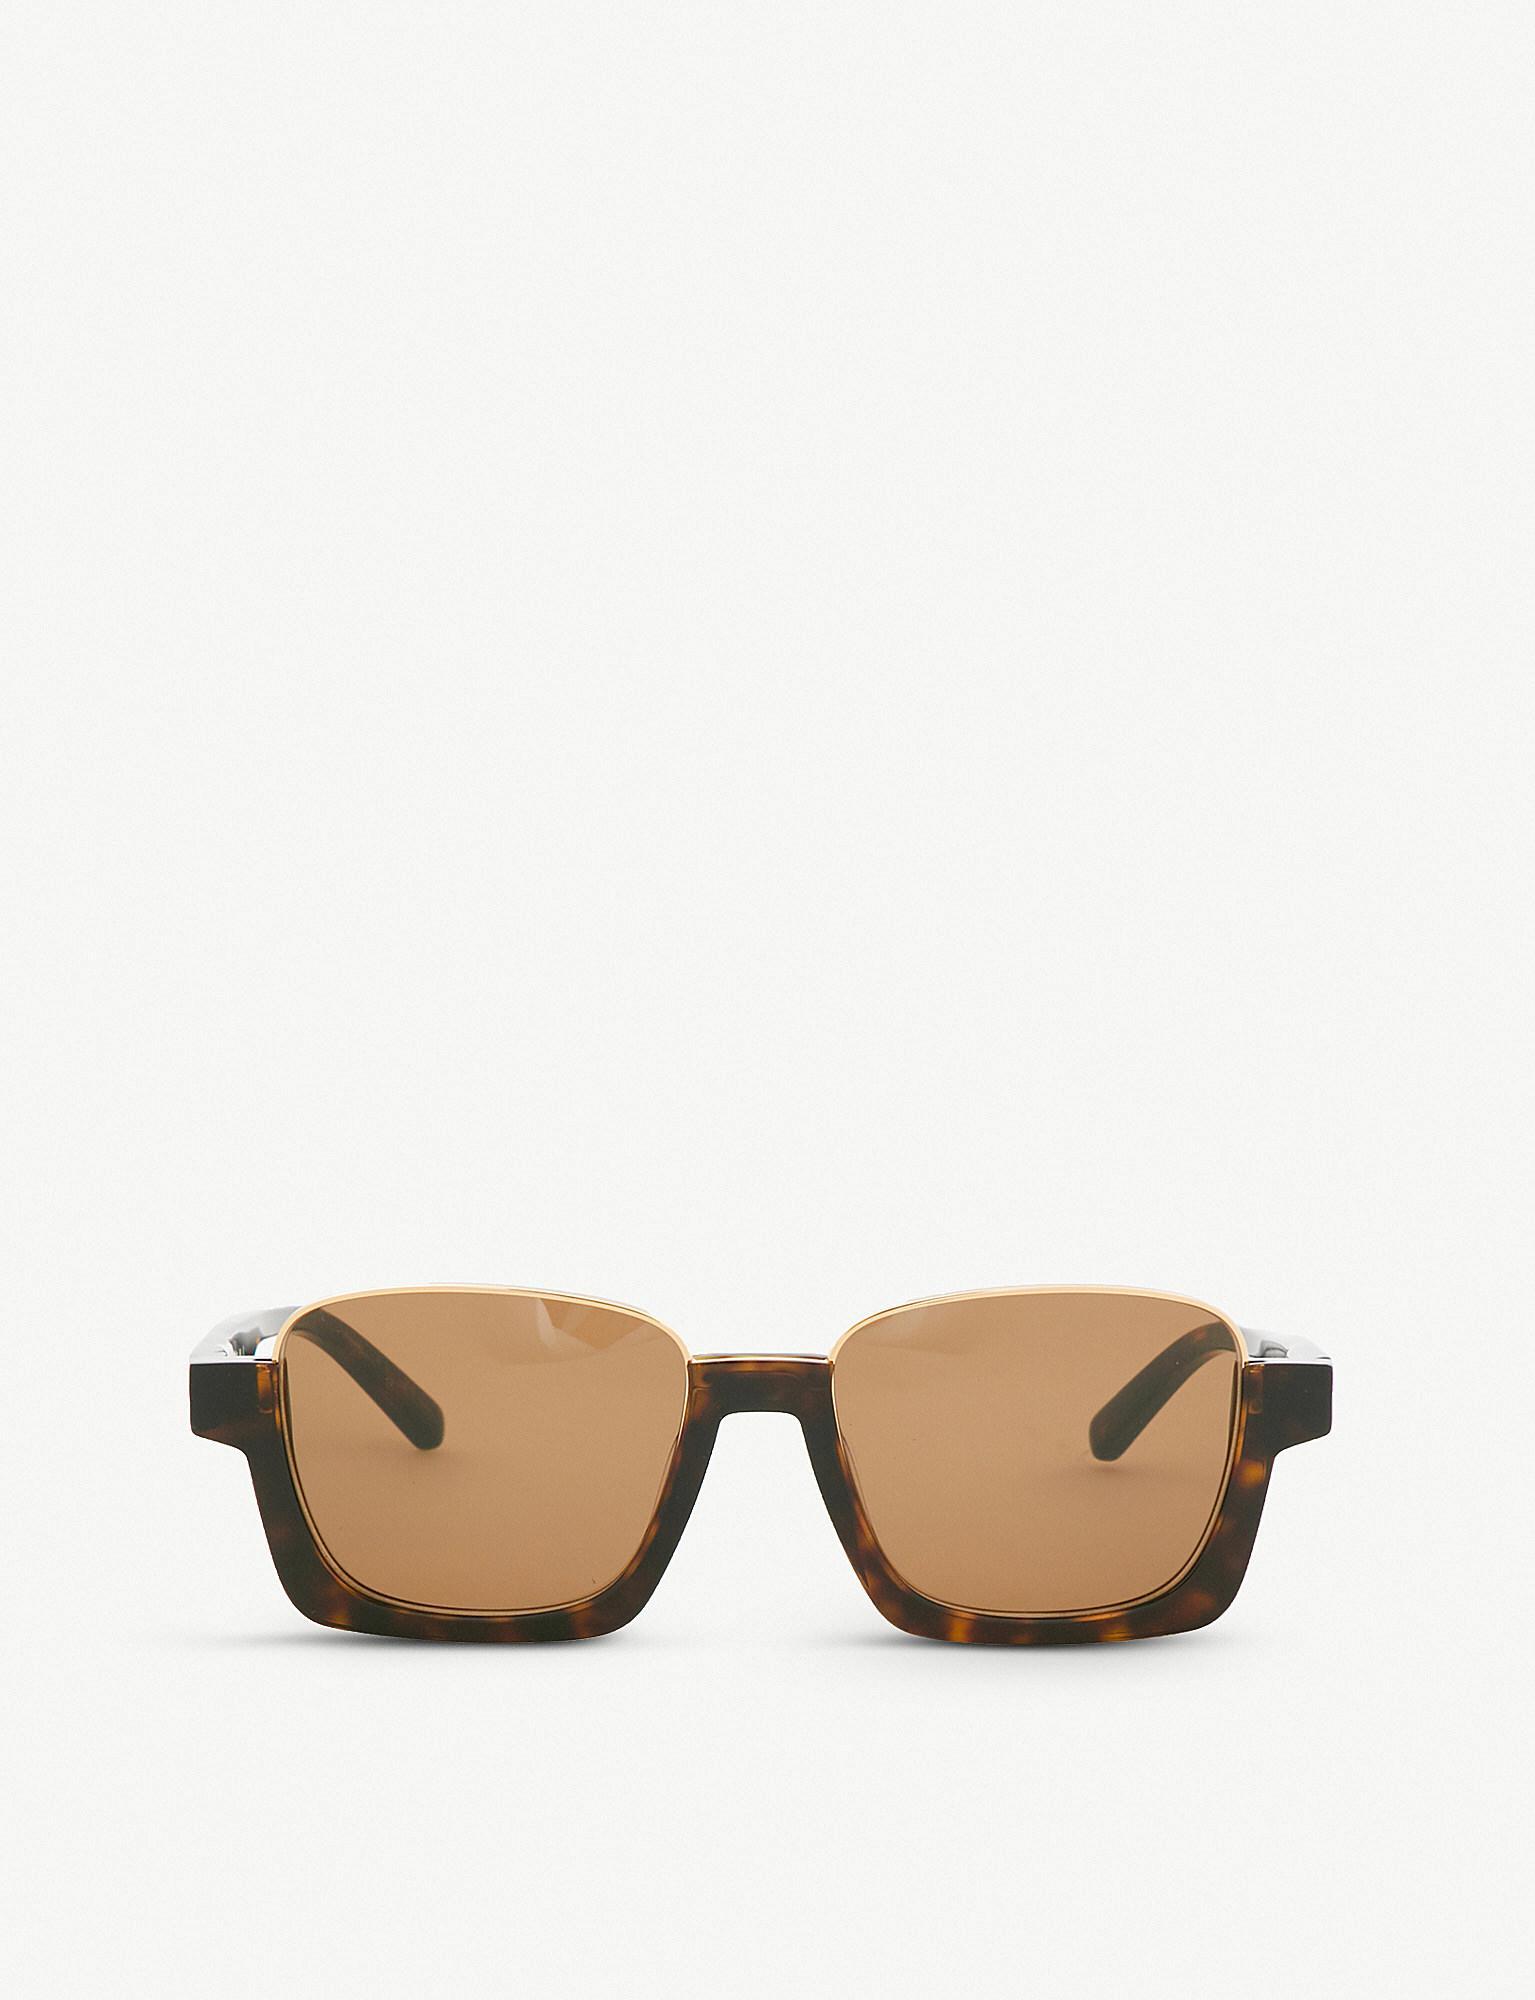 a2128b82eb6 Lyst - Marni Me613s Rectangular-frame Sunglasses in Brown